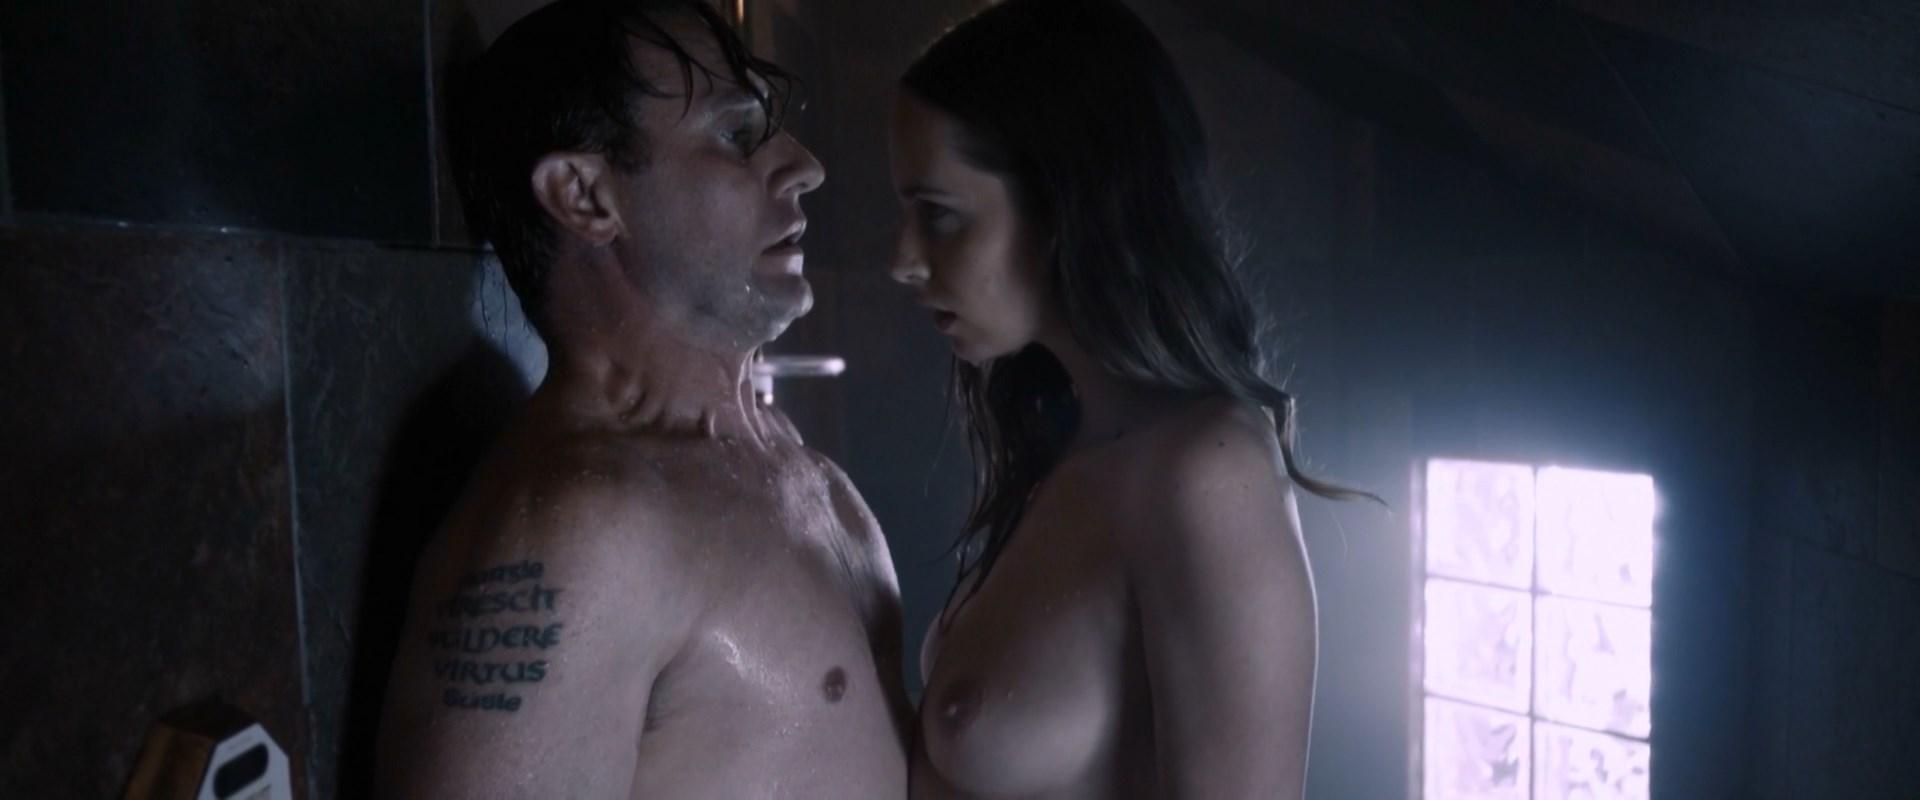 Miley Cyrus ELLE UK, October 2015,Denise cotte Sex images Elettra lamborghini tits,Nadia hilker topless